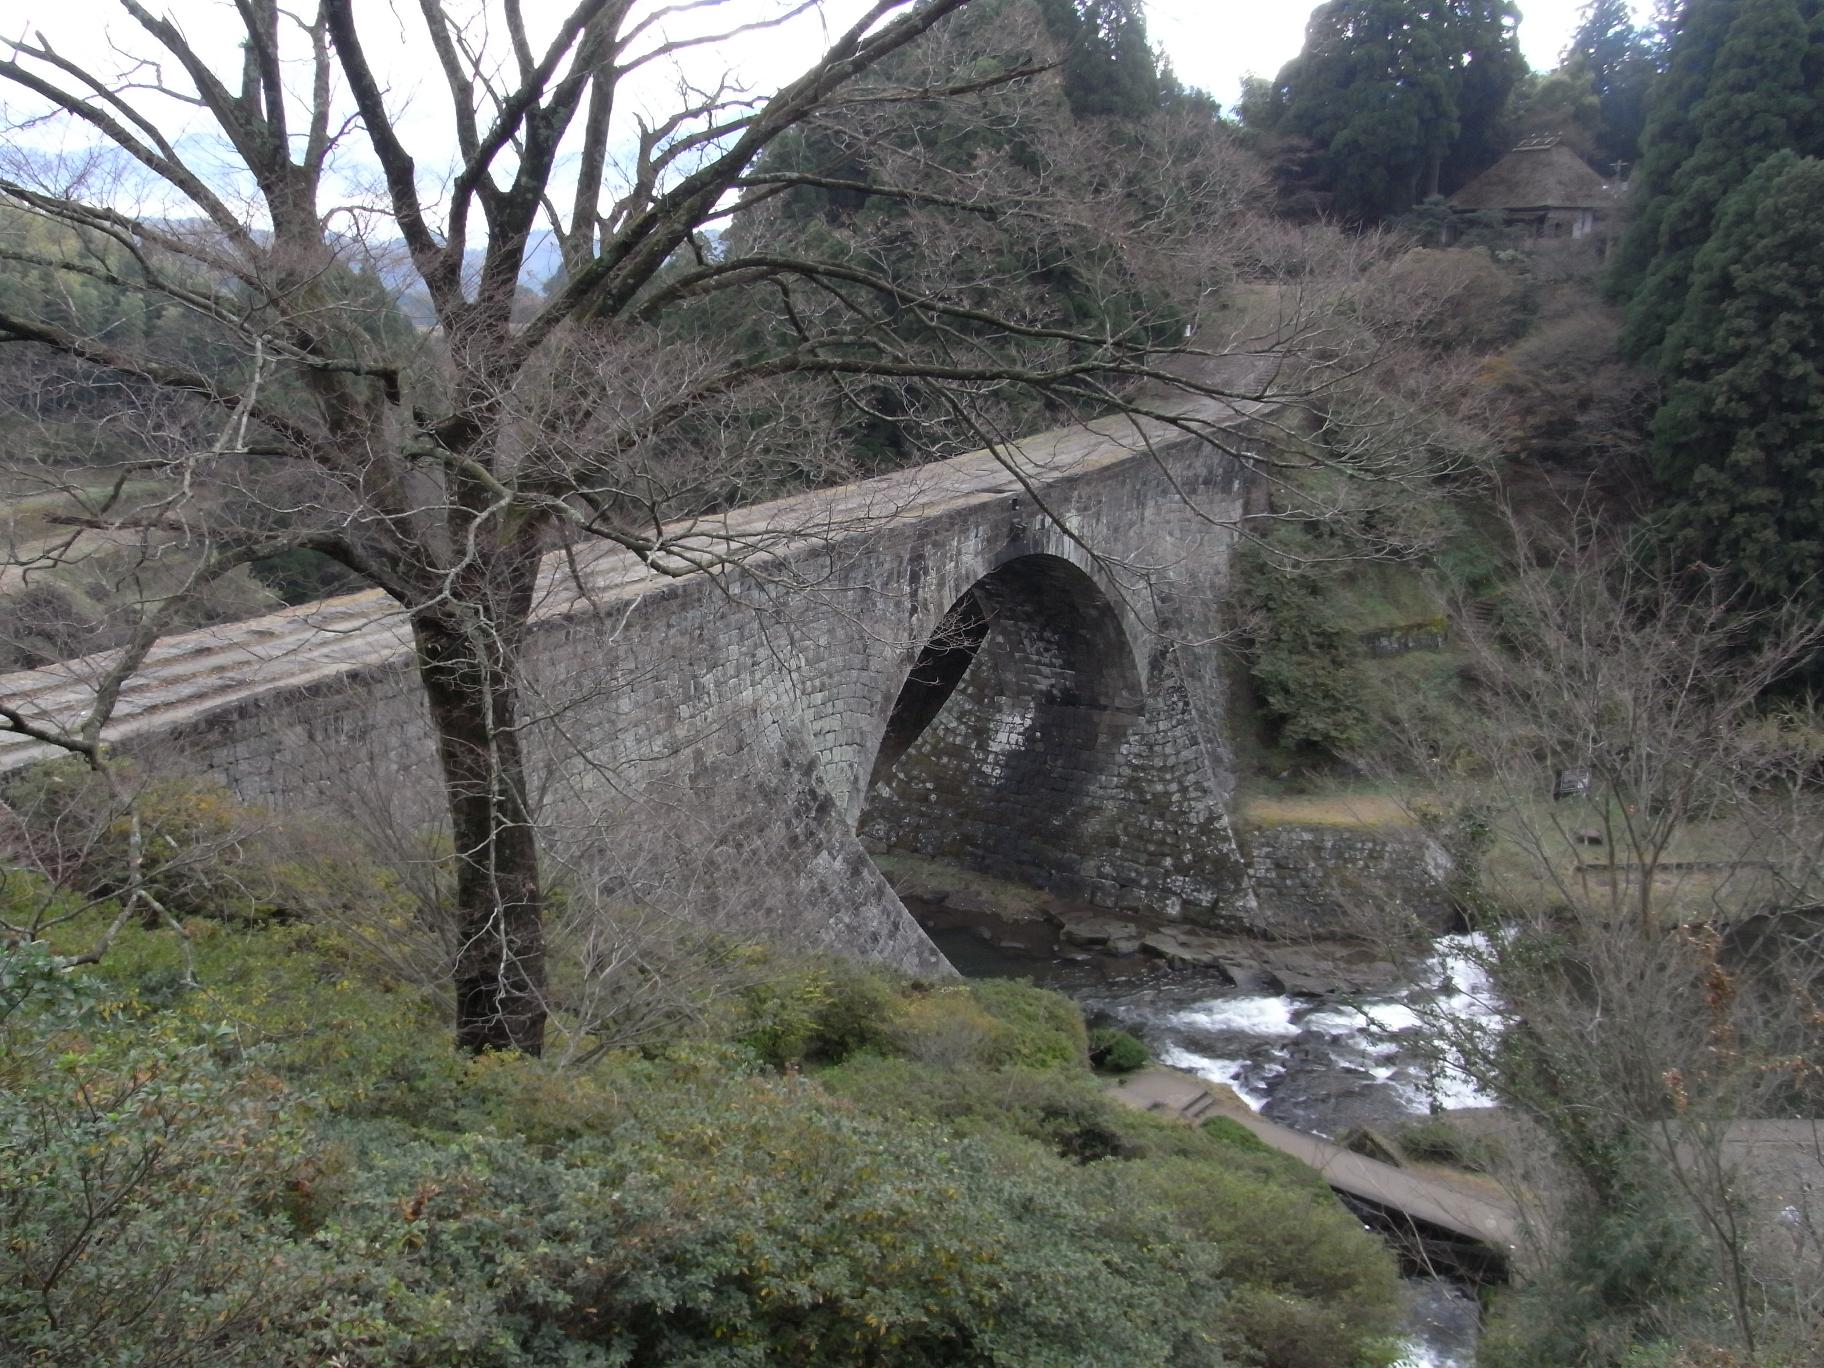 [自転車旅行]2012/12/03:熊本県上益城郡山都町~八代市(ネットカフェ)